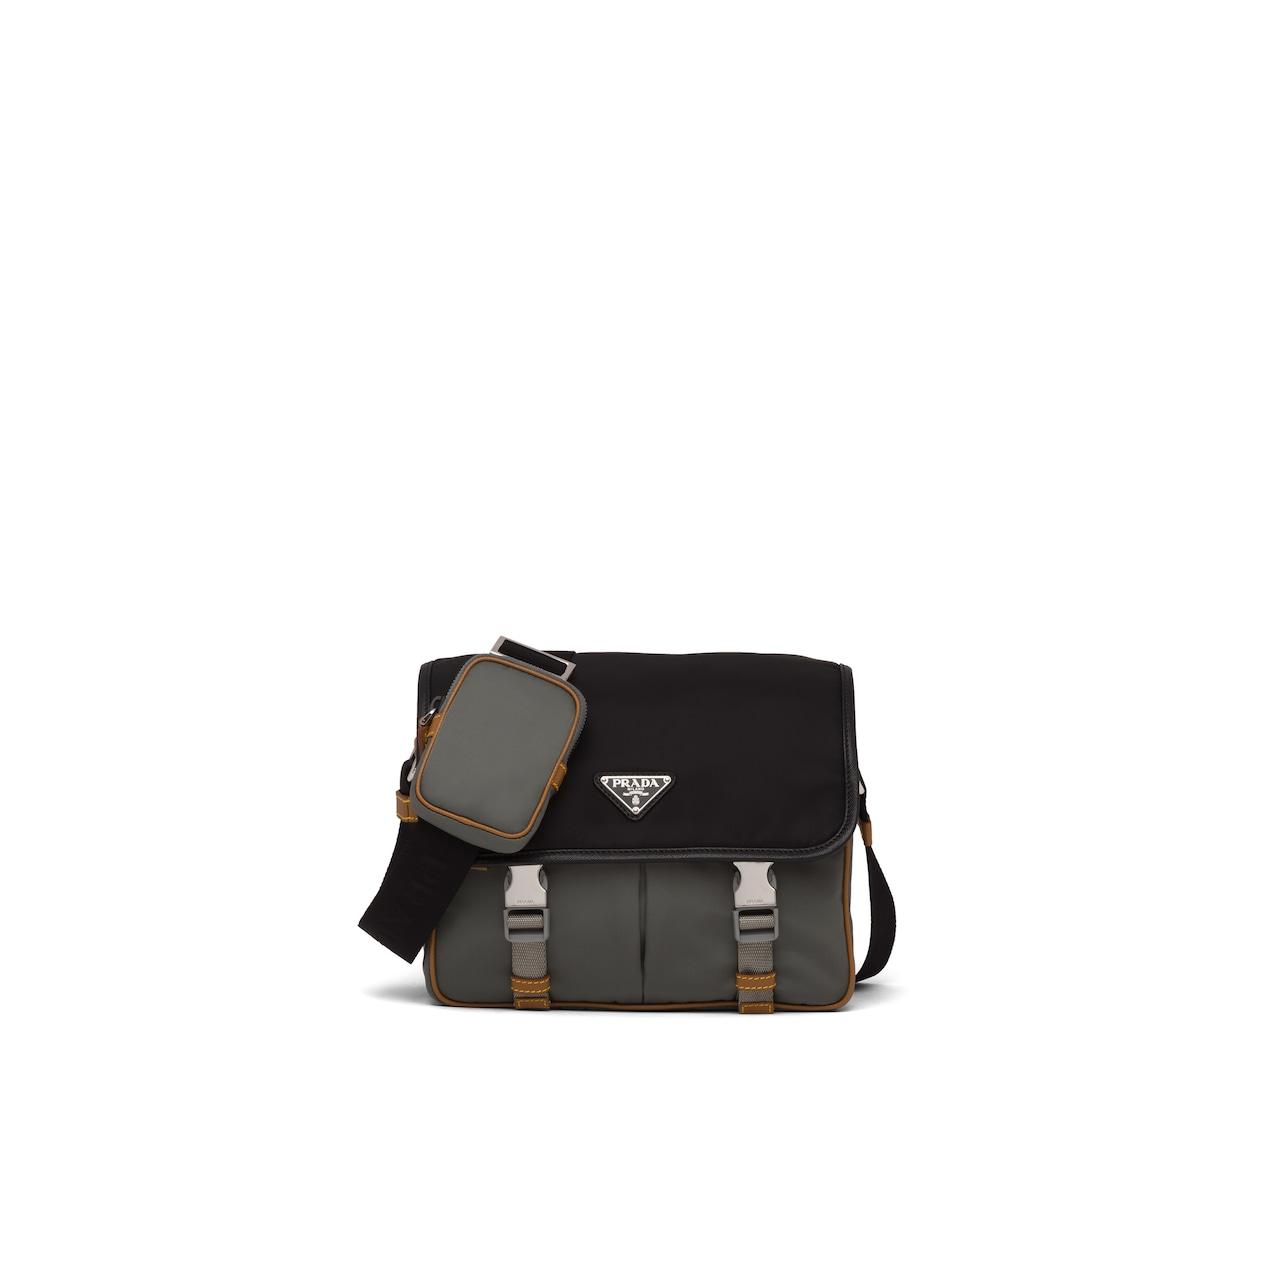 Prada 尼龙和 Saffiano 皮革斜挎包 1